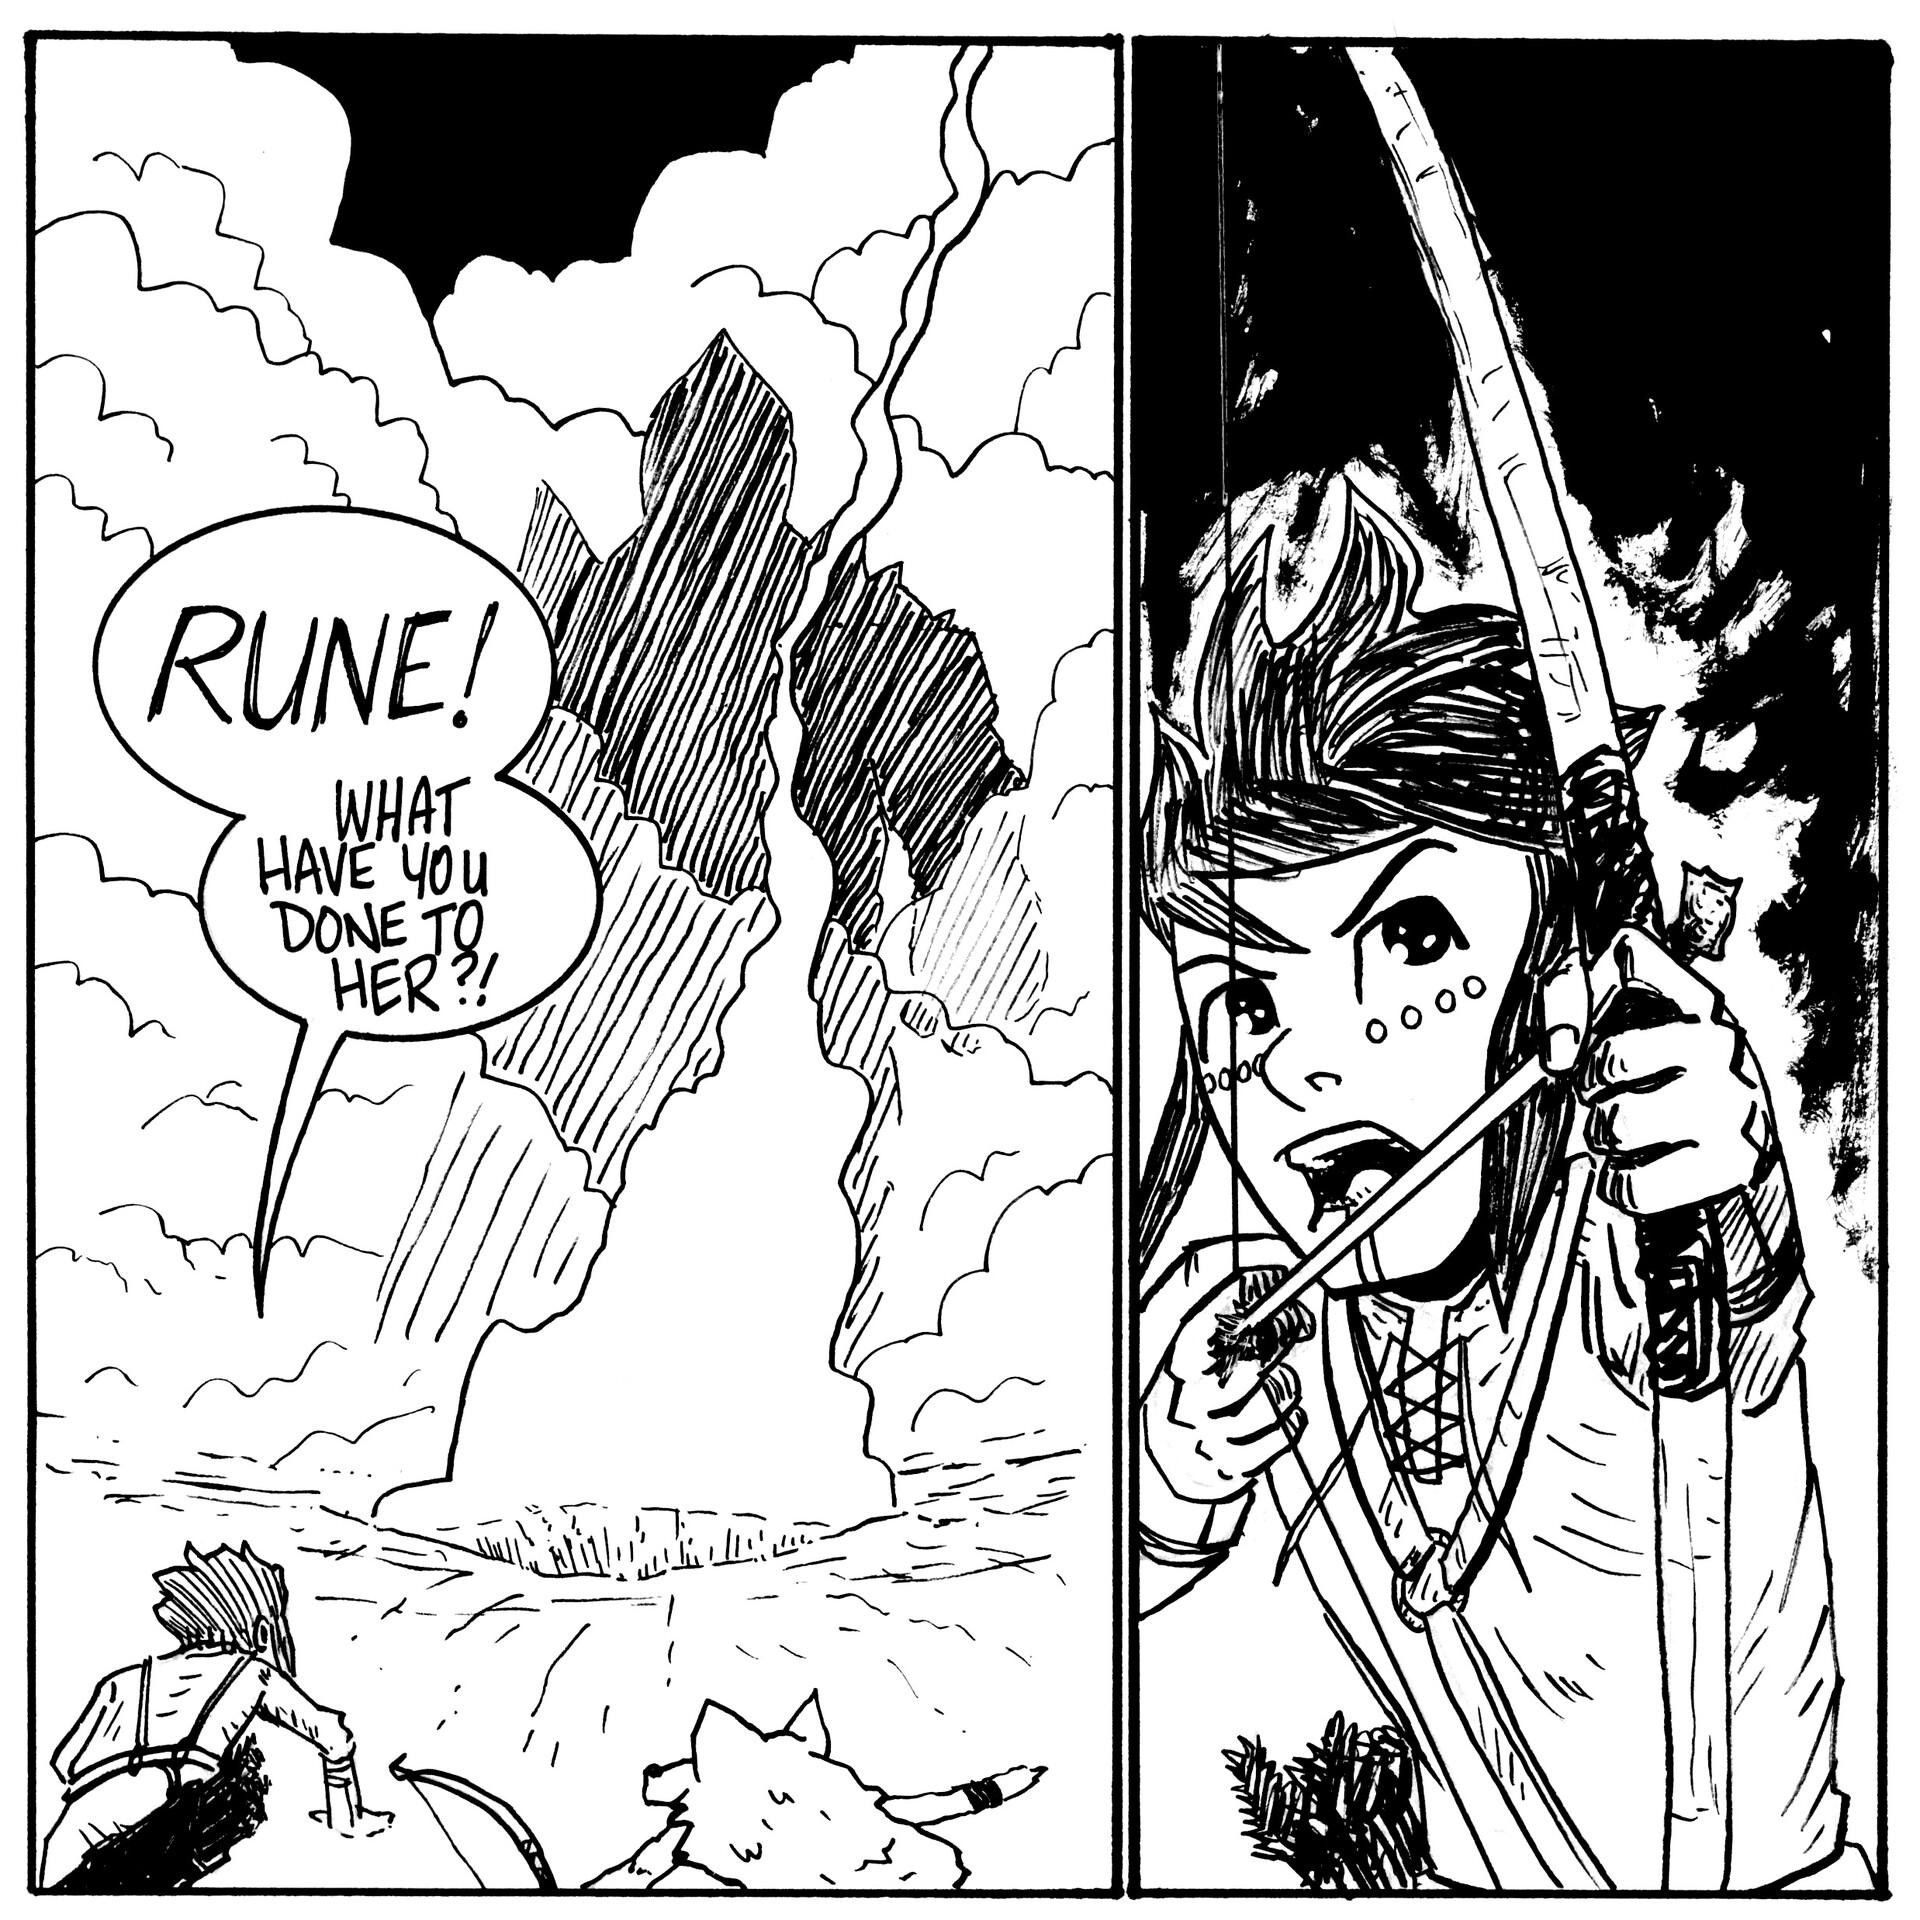 Randy haldeman rune inktober page 24